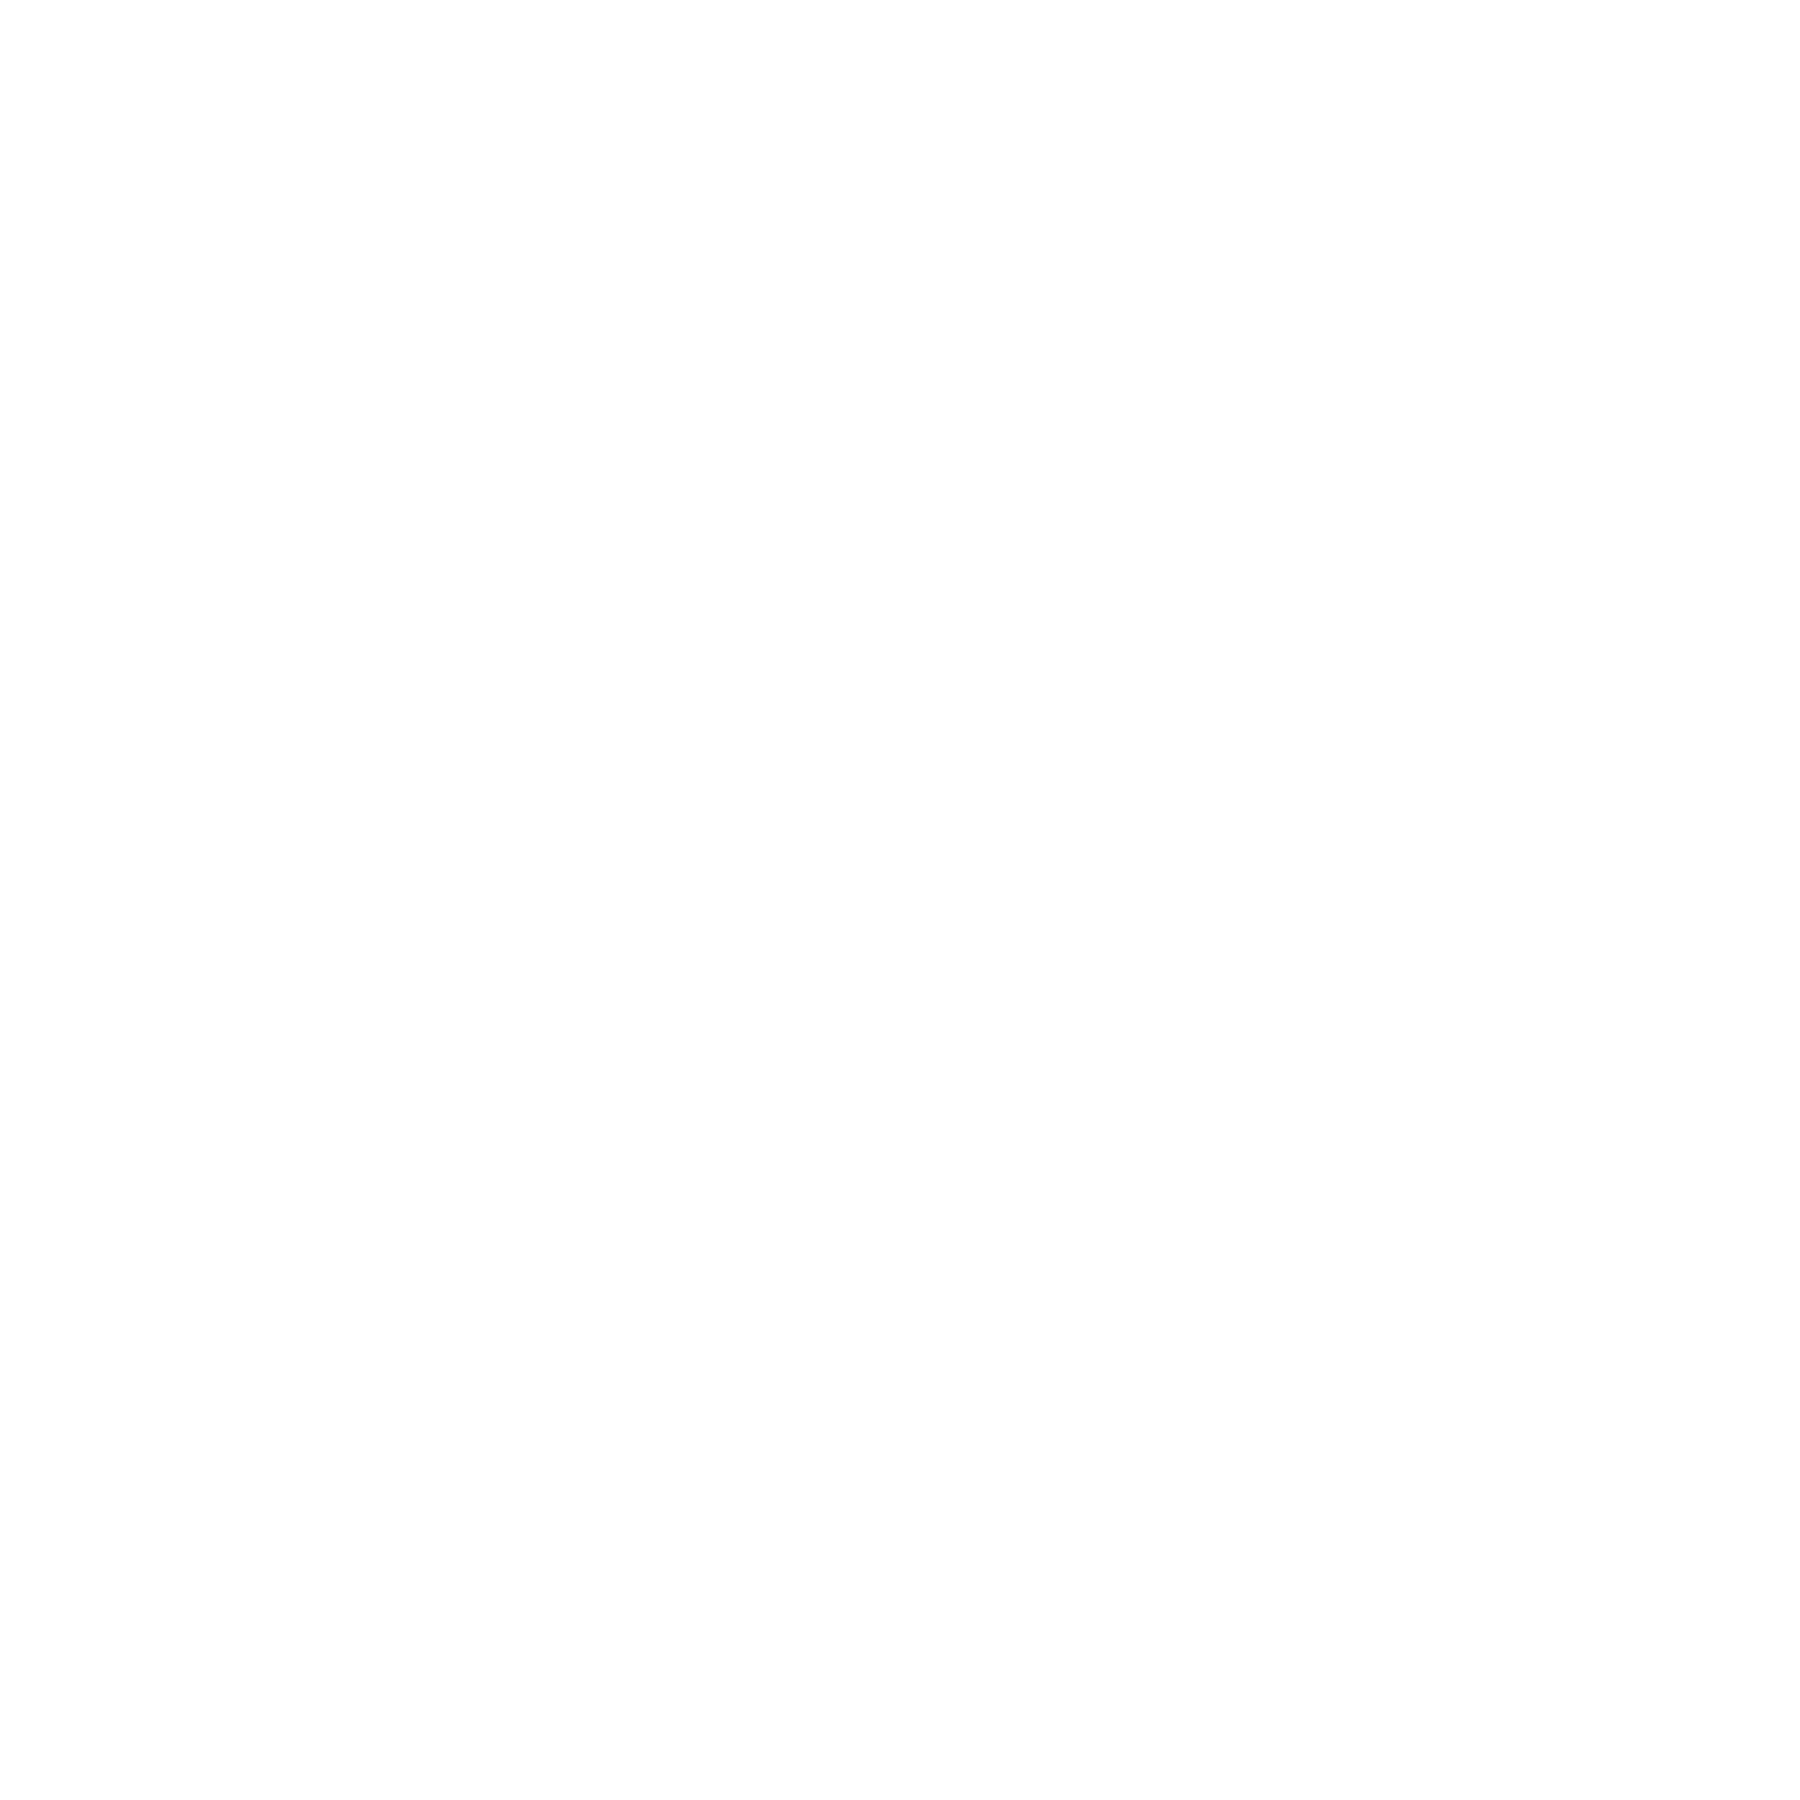 web paws logos - white.png